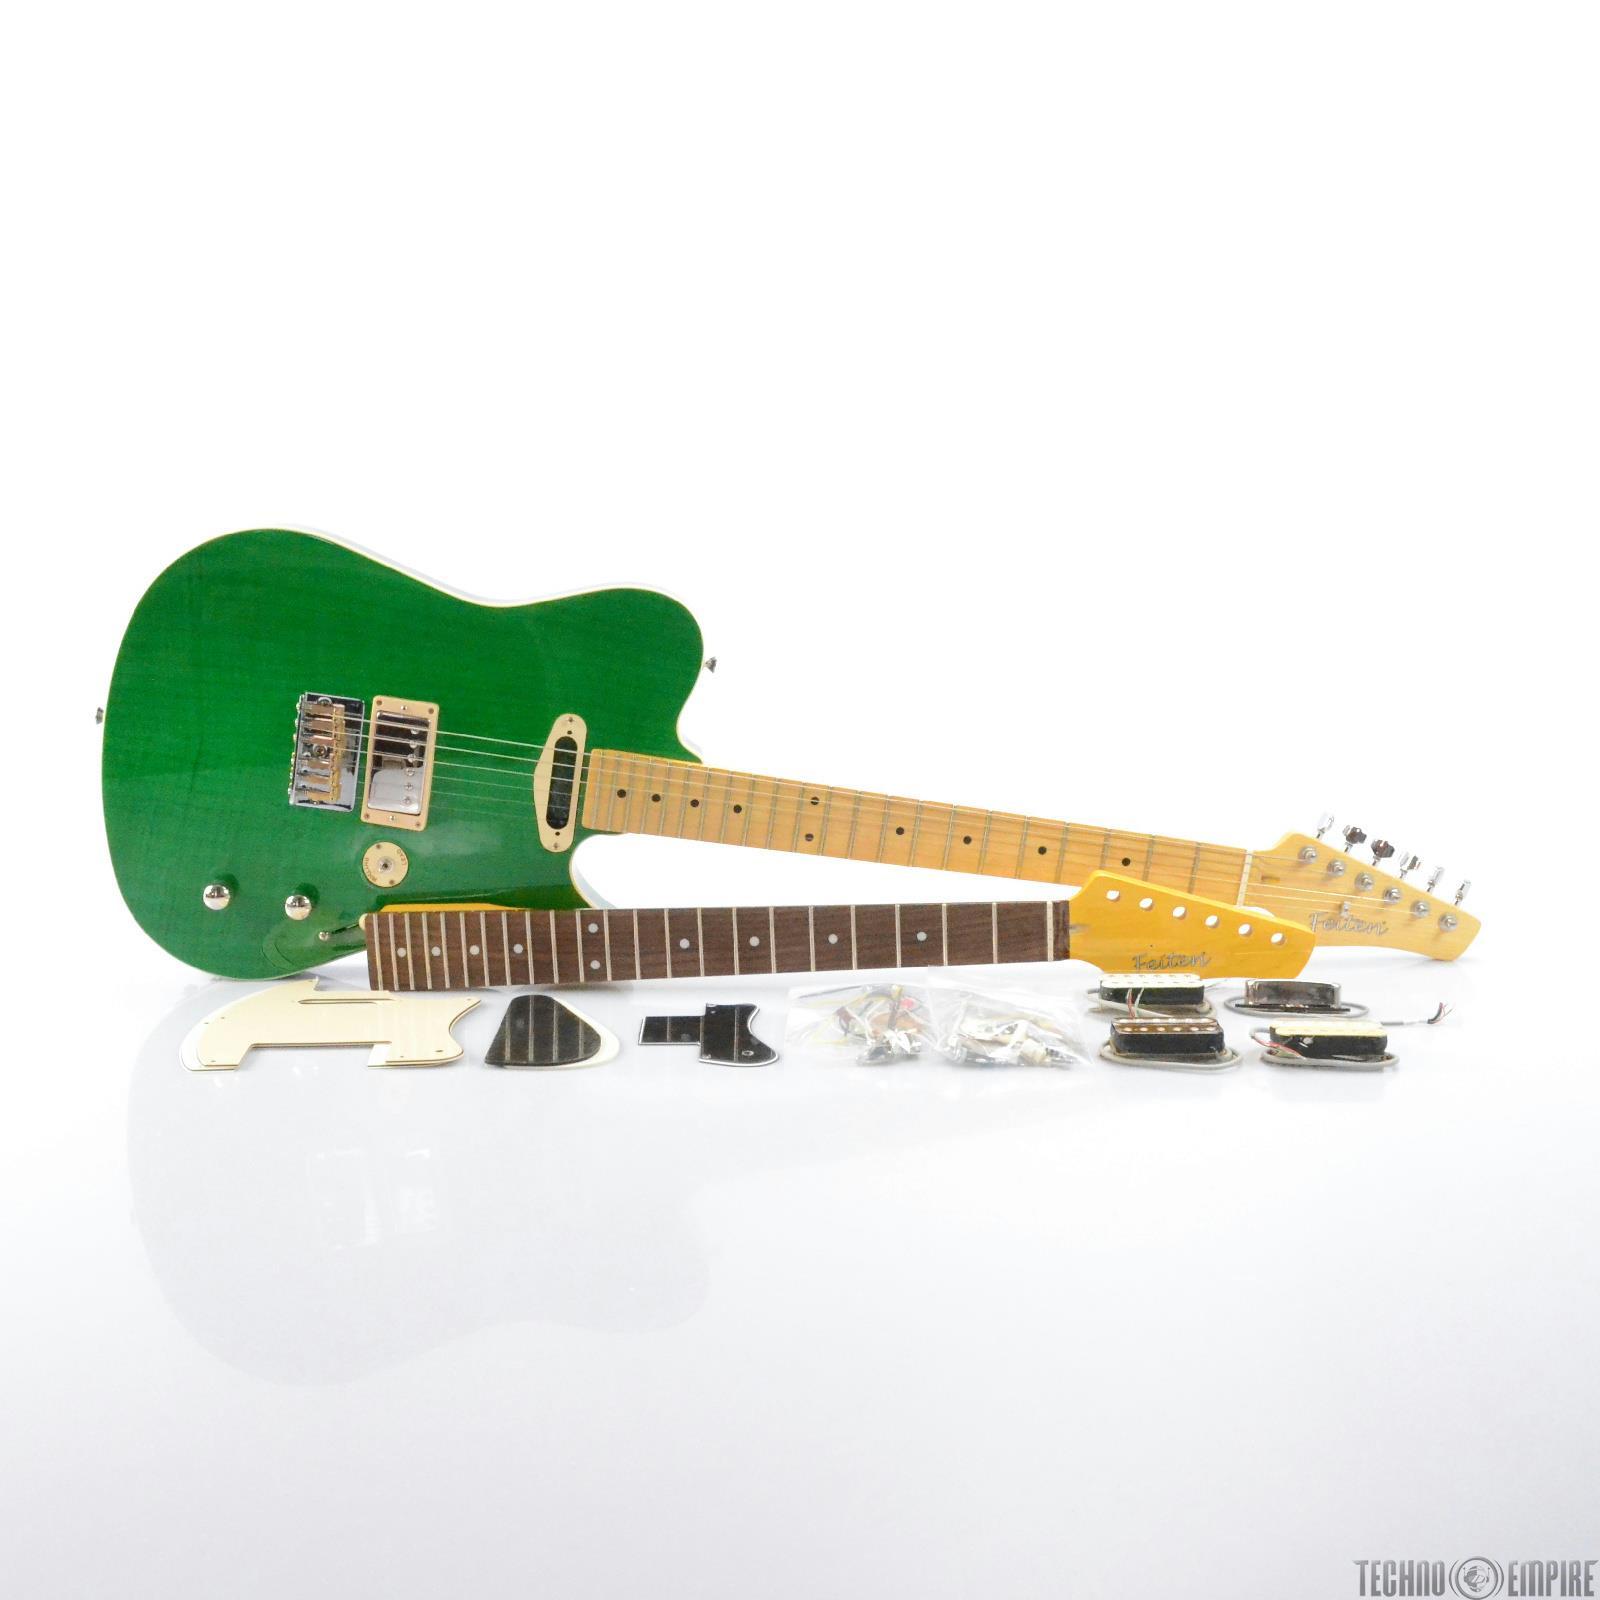 Buzz Feiten Blues Pro DLX Build Your Own Electric Guitar Kit #28534